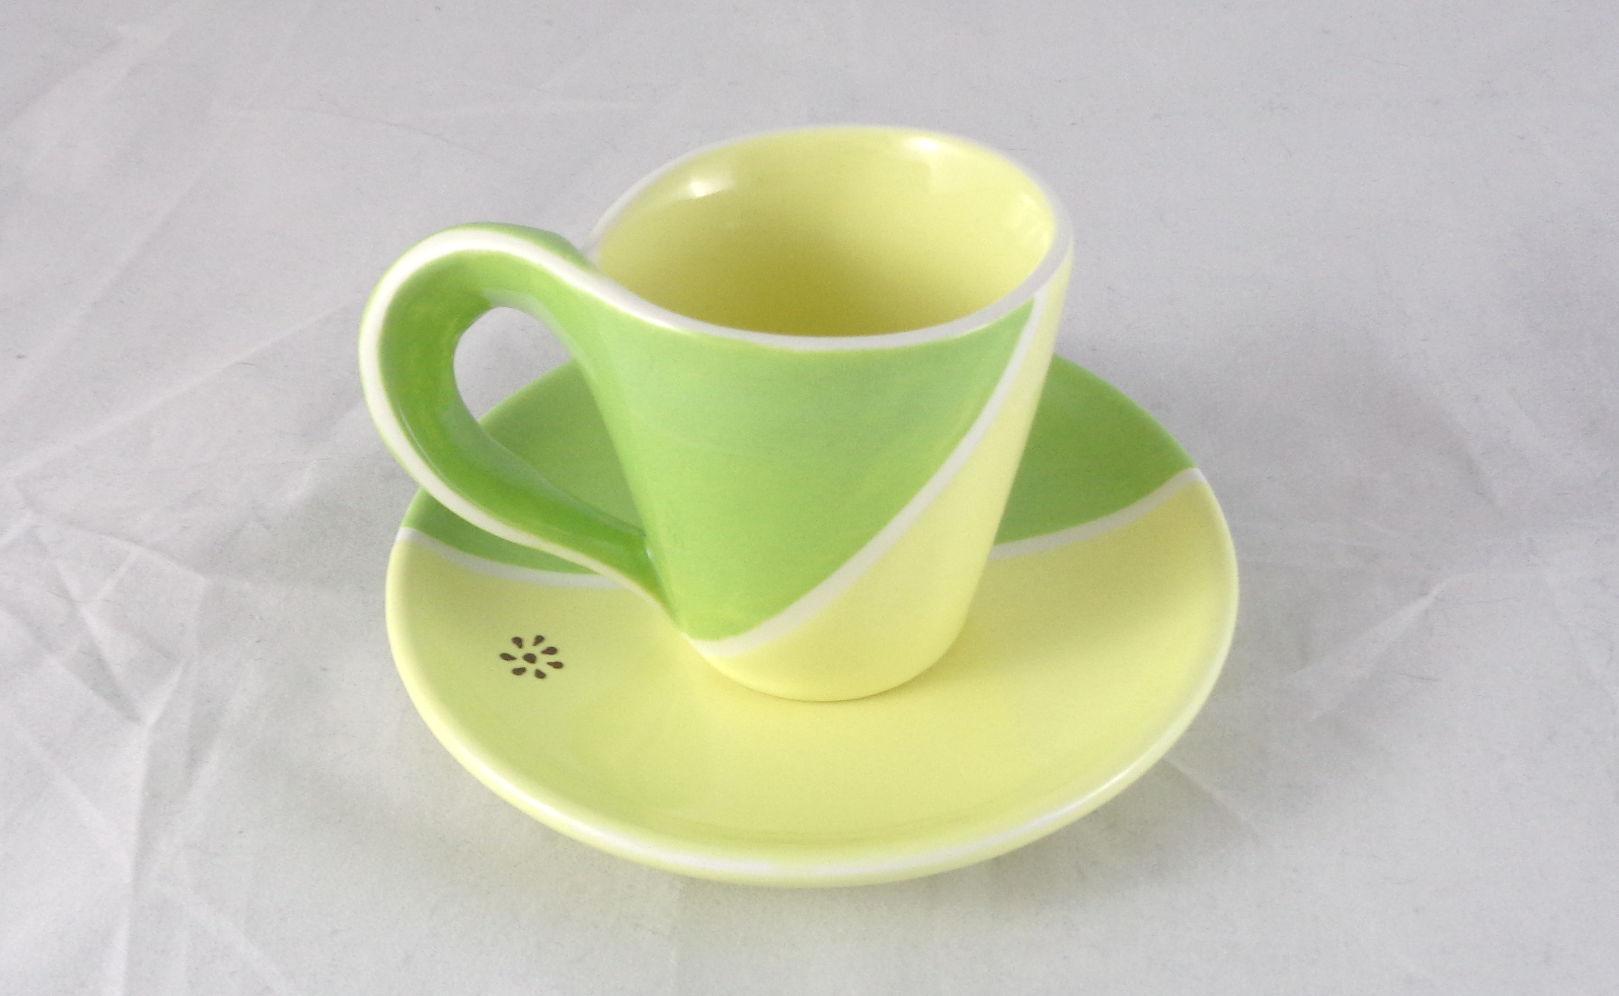 Bemalte Keramik Espresso-Set gelb-grün